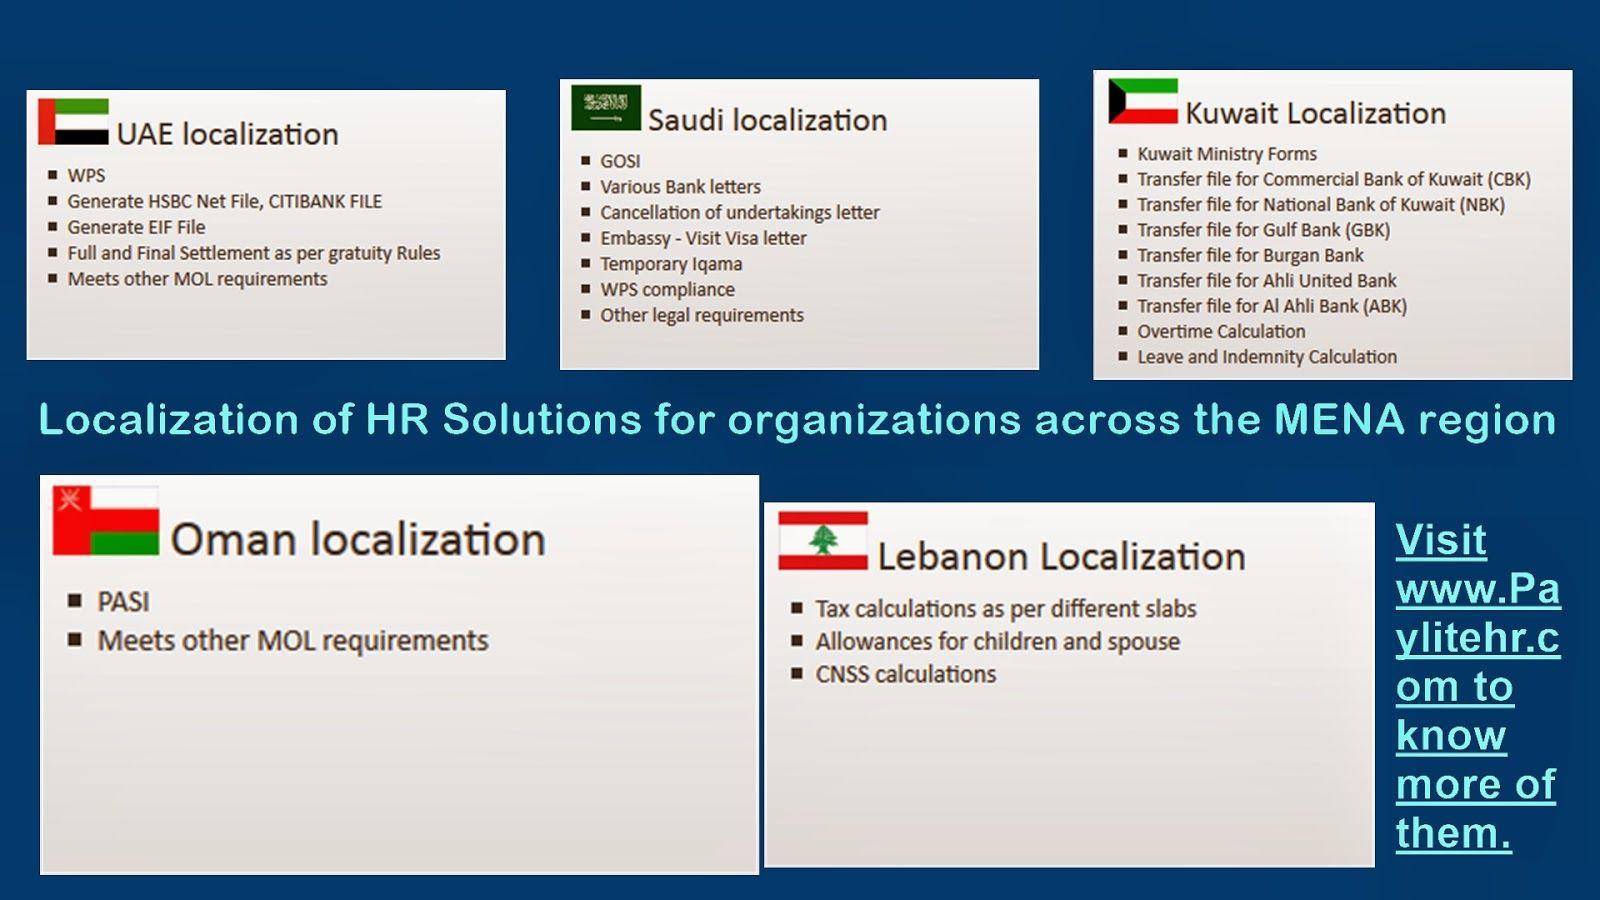 Hsbc Net File Uae  Gosi Bahrain Saudi ArabiaPasi Oman